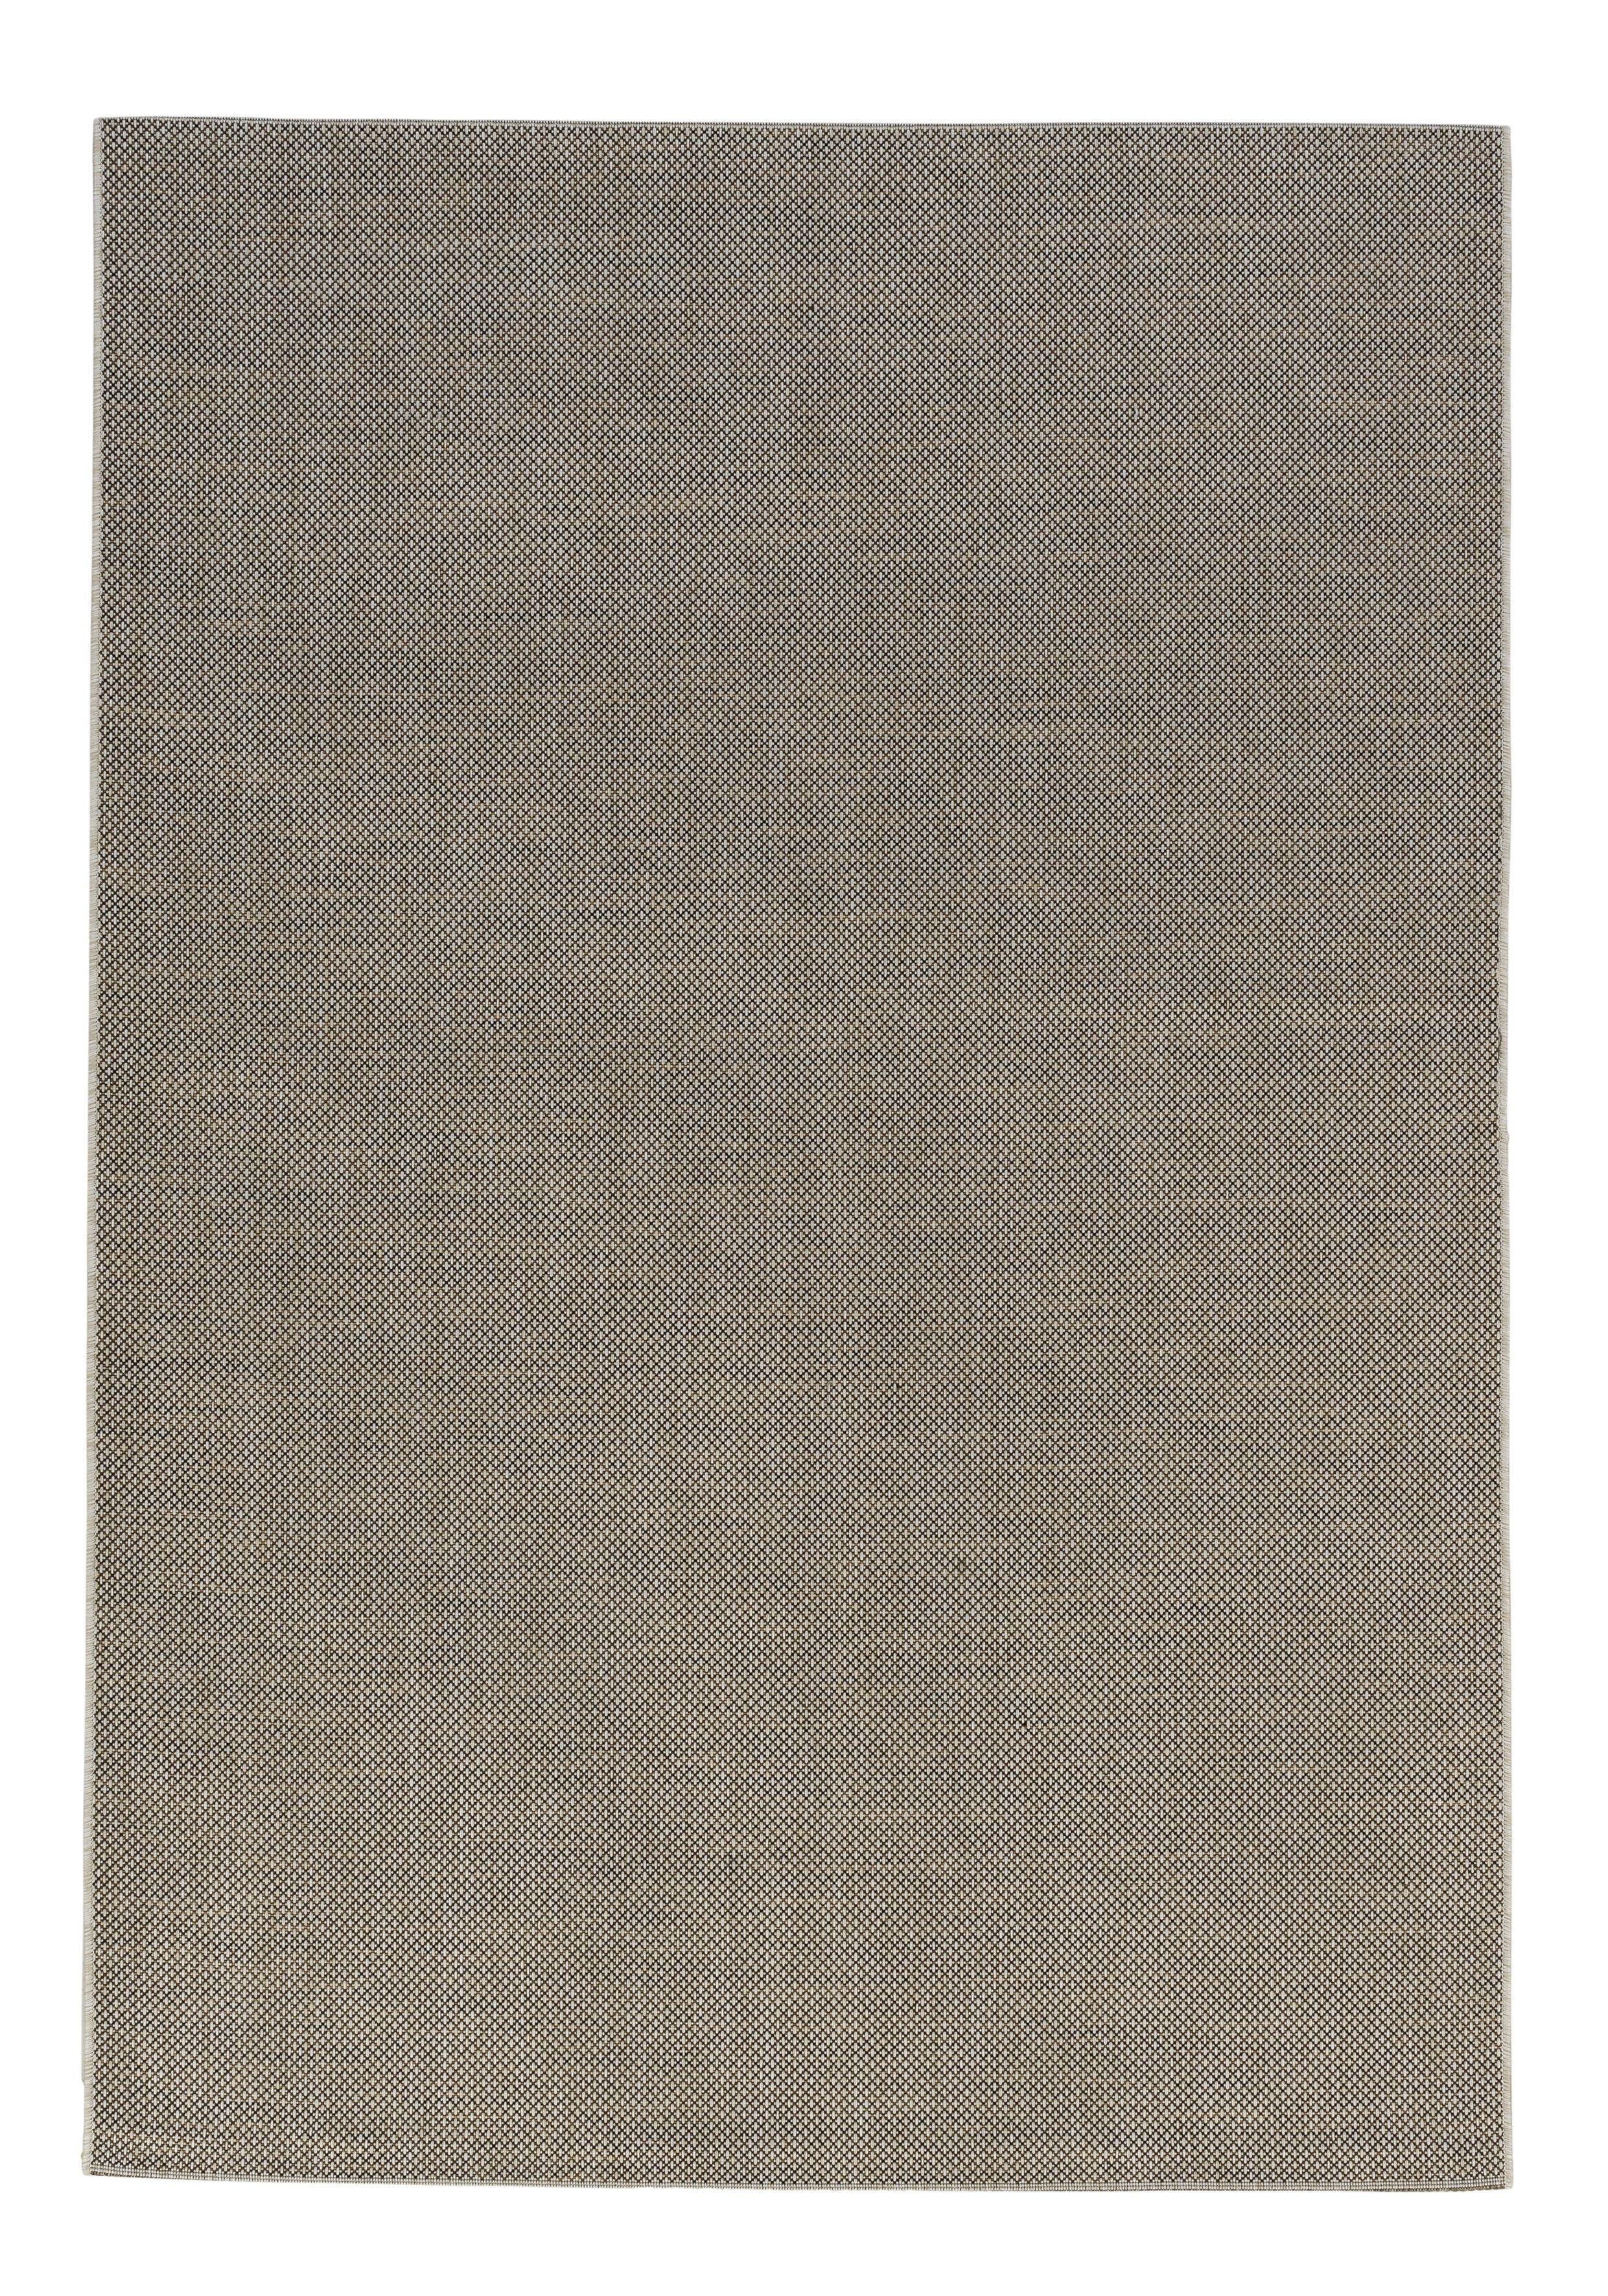 Astra - Golze koberce Kusový koberec Rho 190060 Brown - 200x290 cm